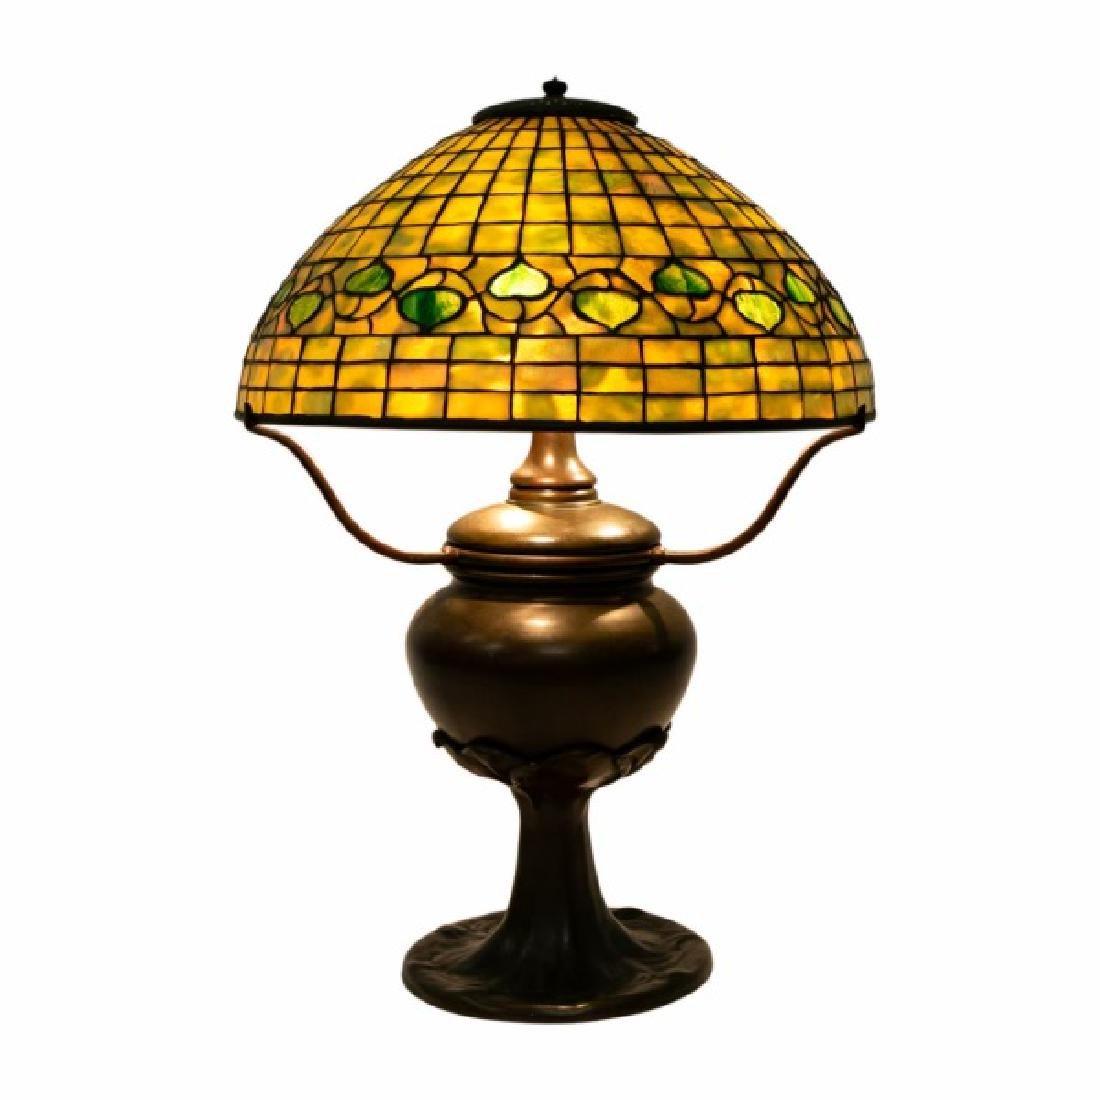 Early Tiffany Studios Acorn Table Lamp